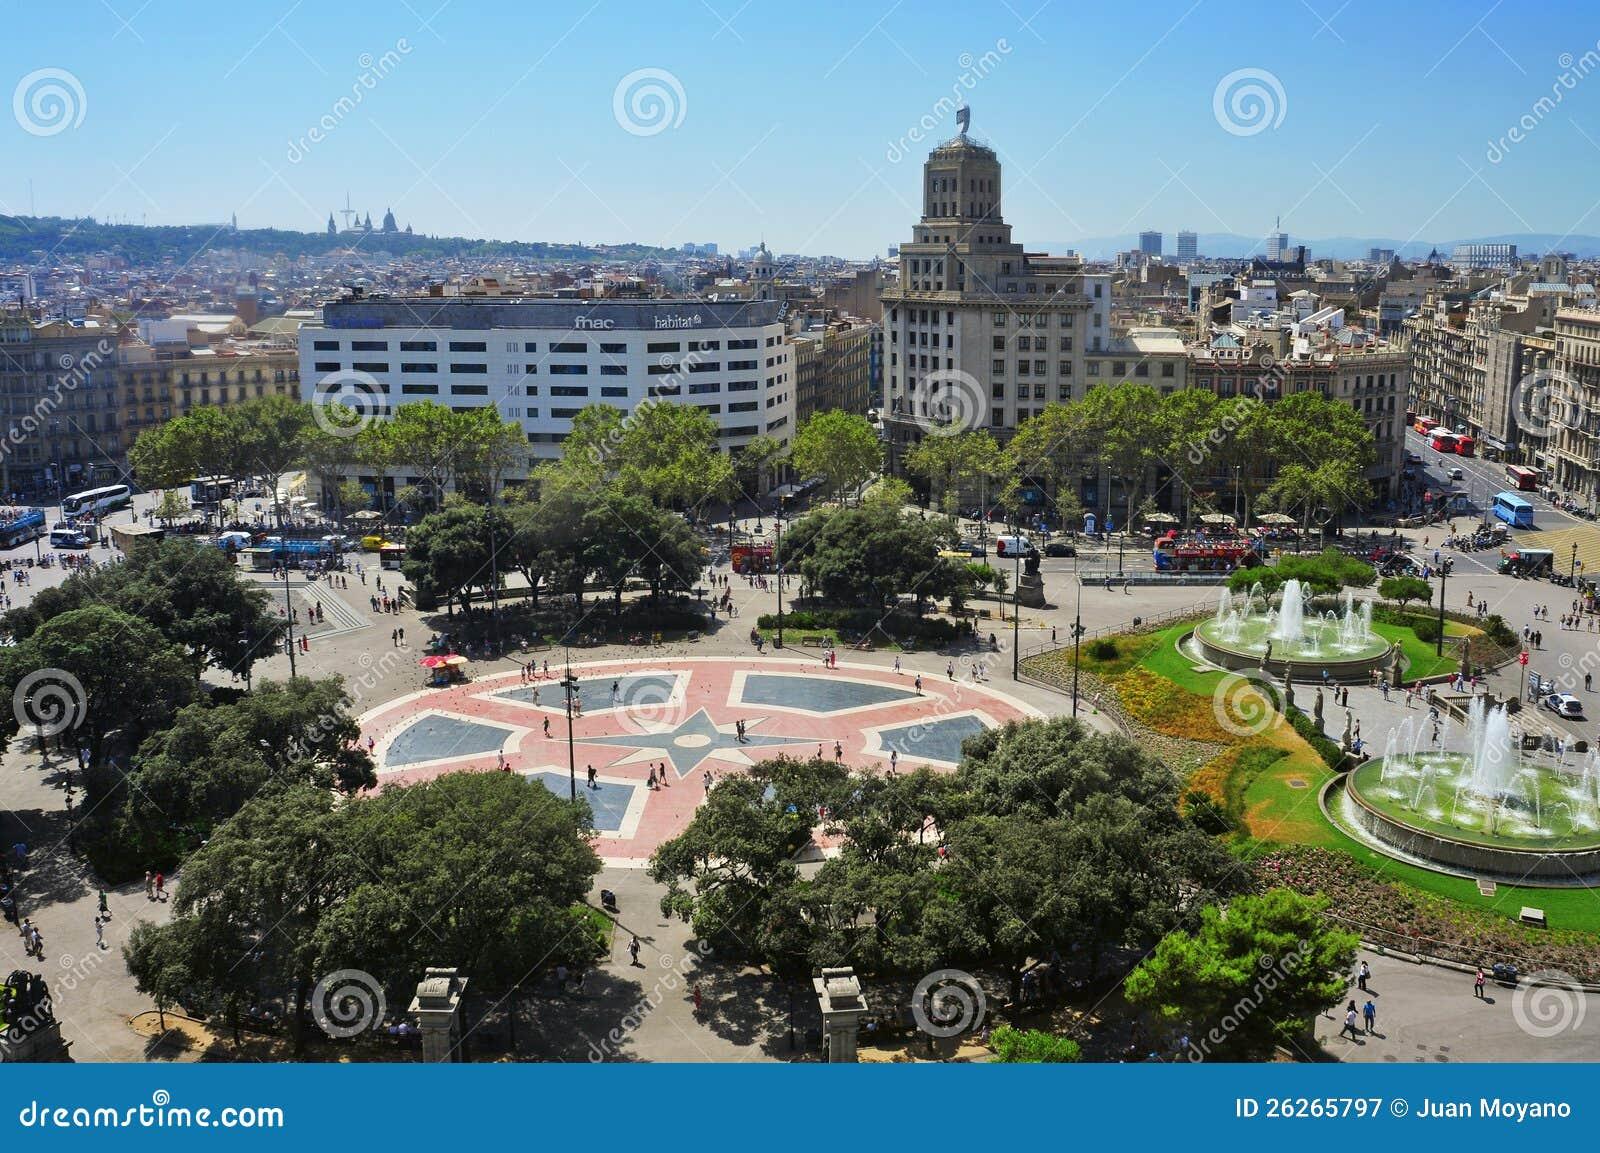 Placa catalunya a barcellona spagna fotografia editoriale for Spagna barcellona